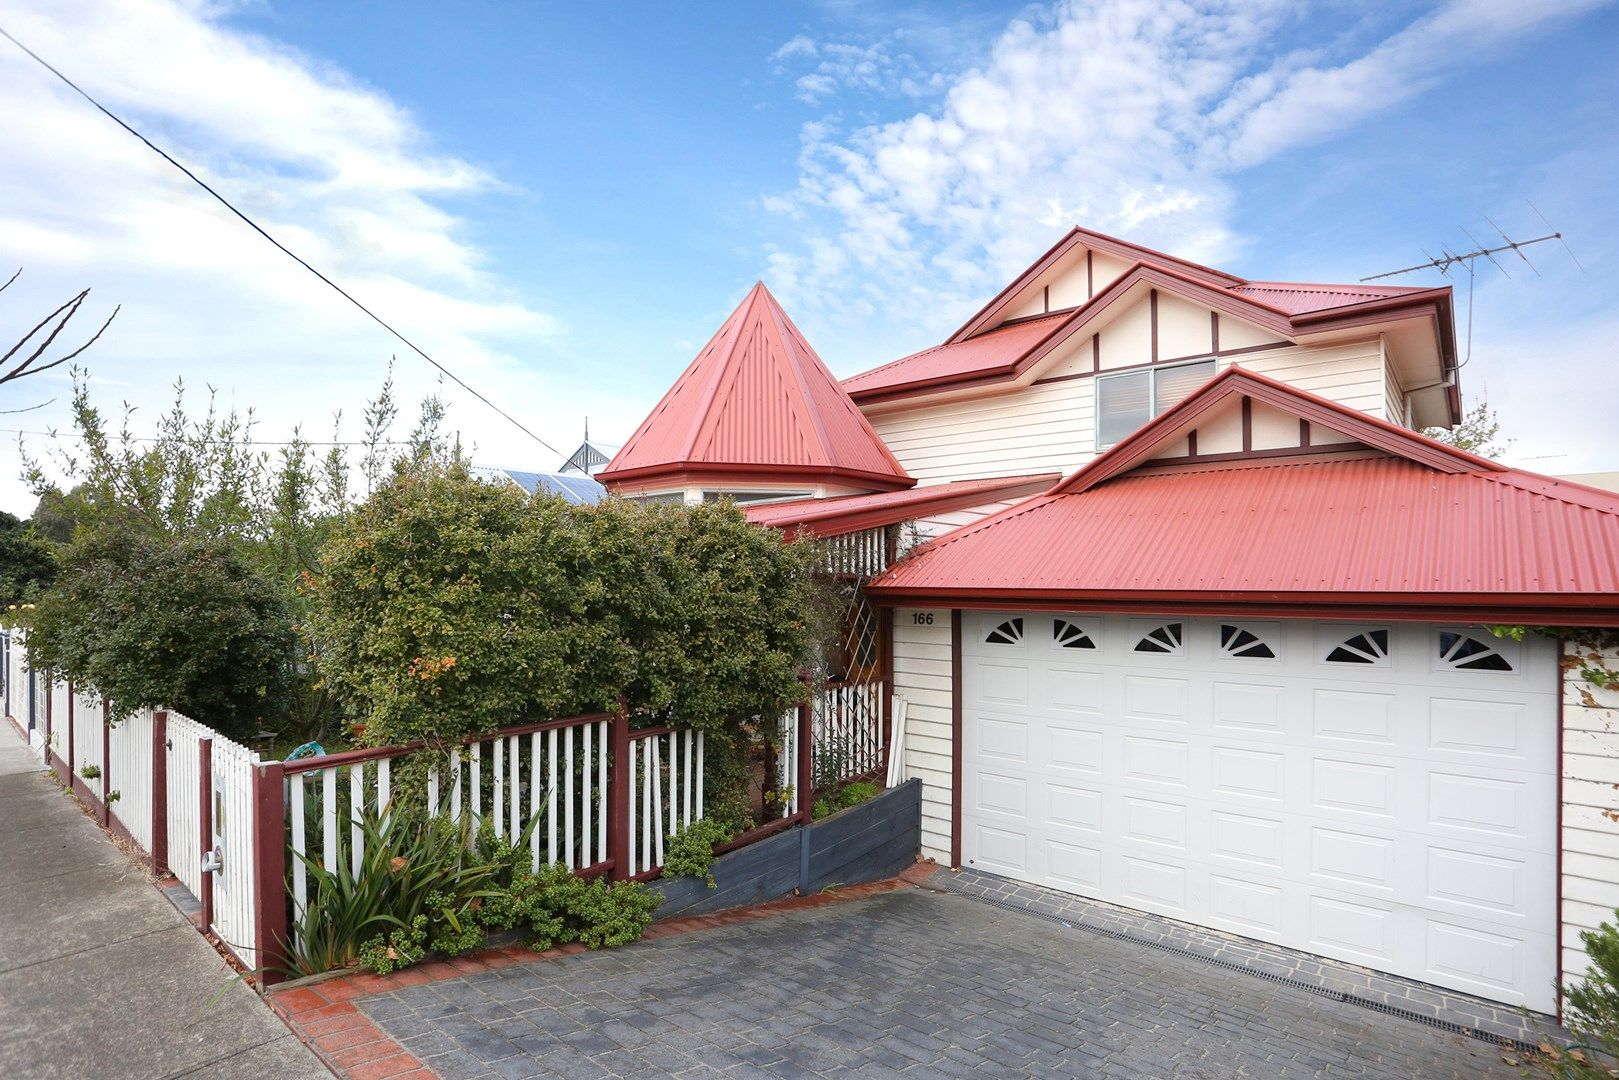 166 The Avenue, Coburg VIC 3058, Image 0